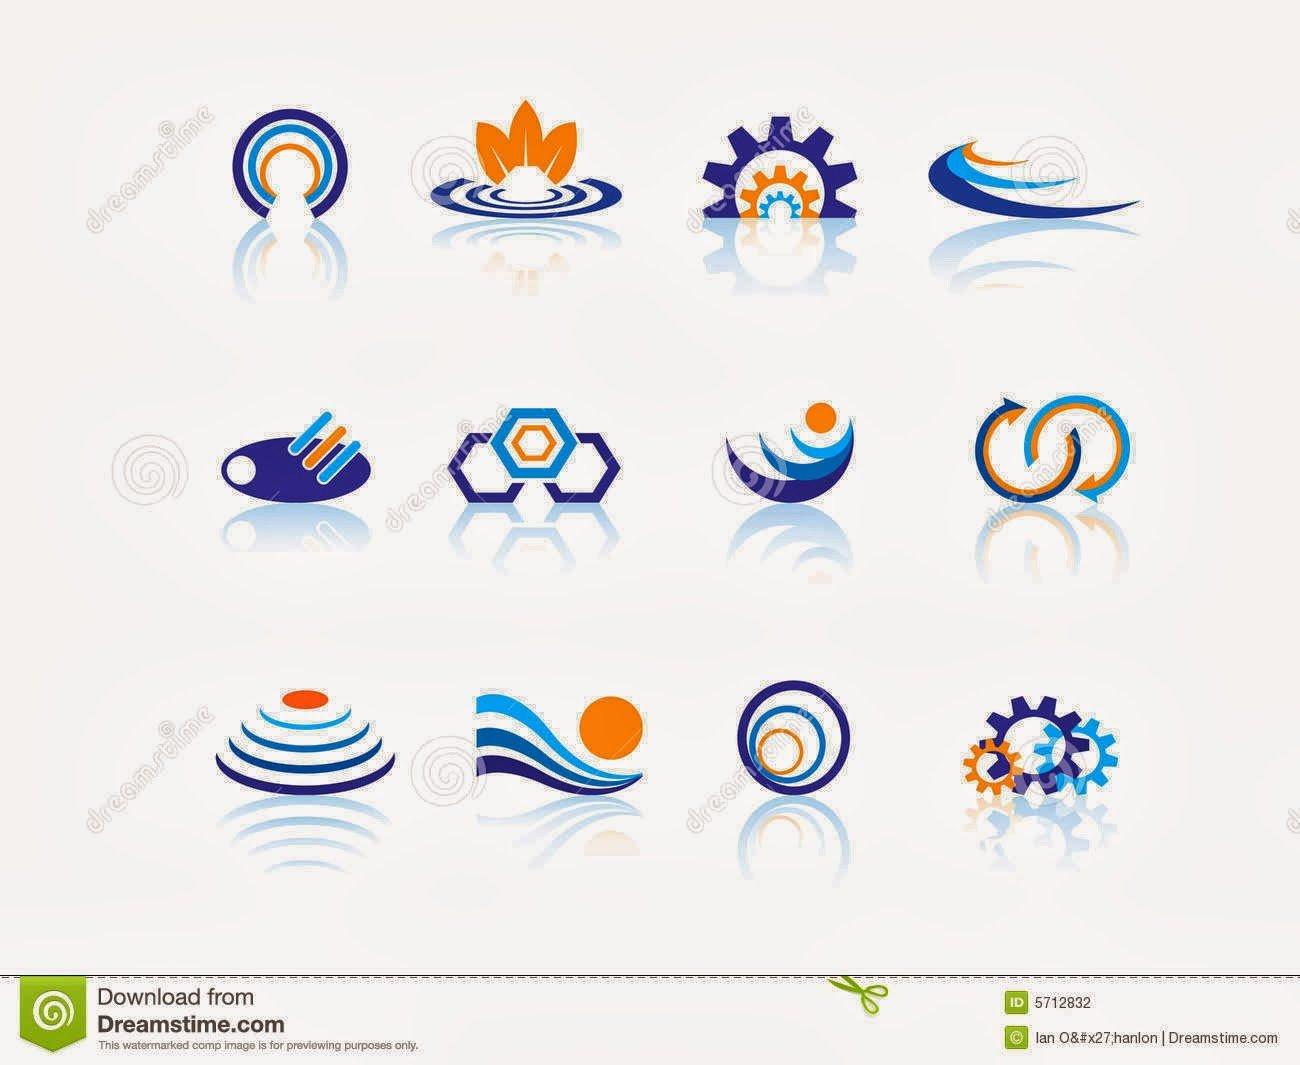 Business Logo Business Logos Design Small Business Logos